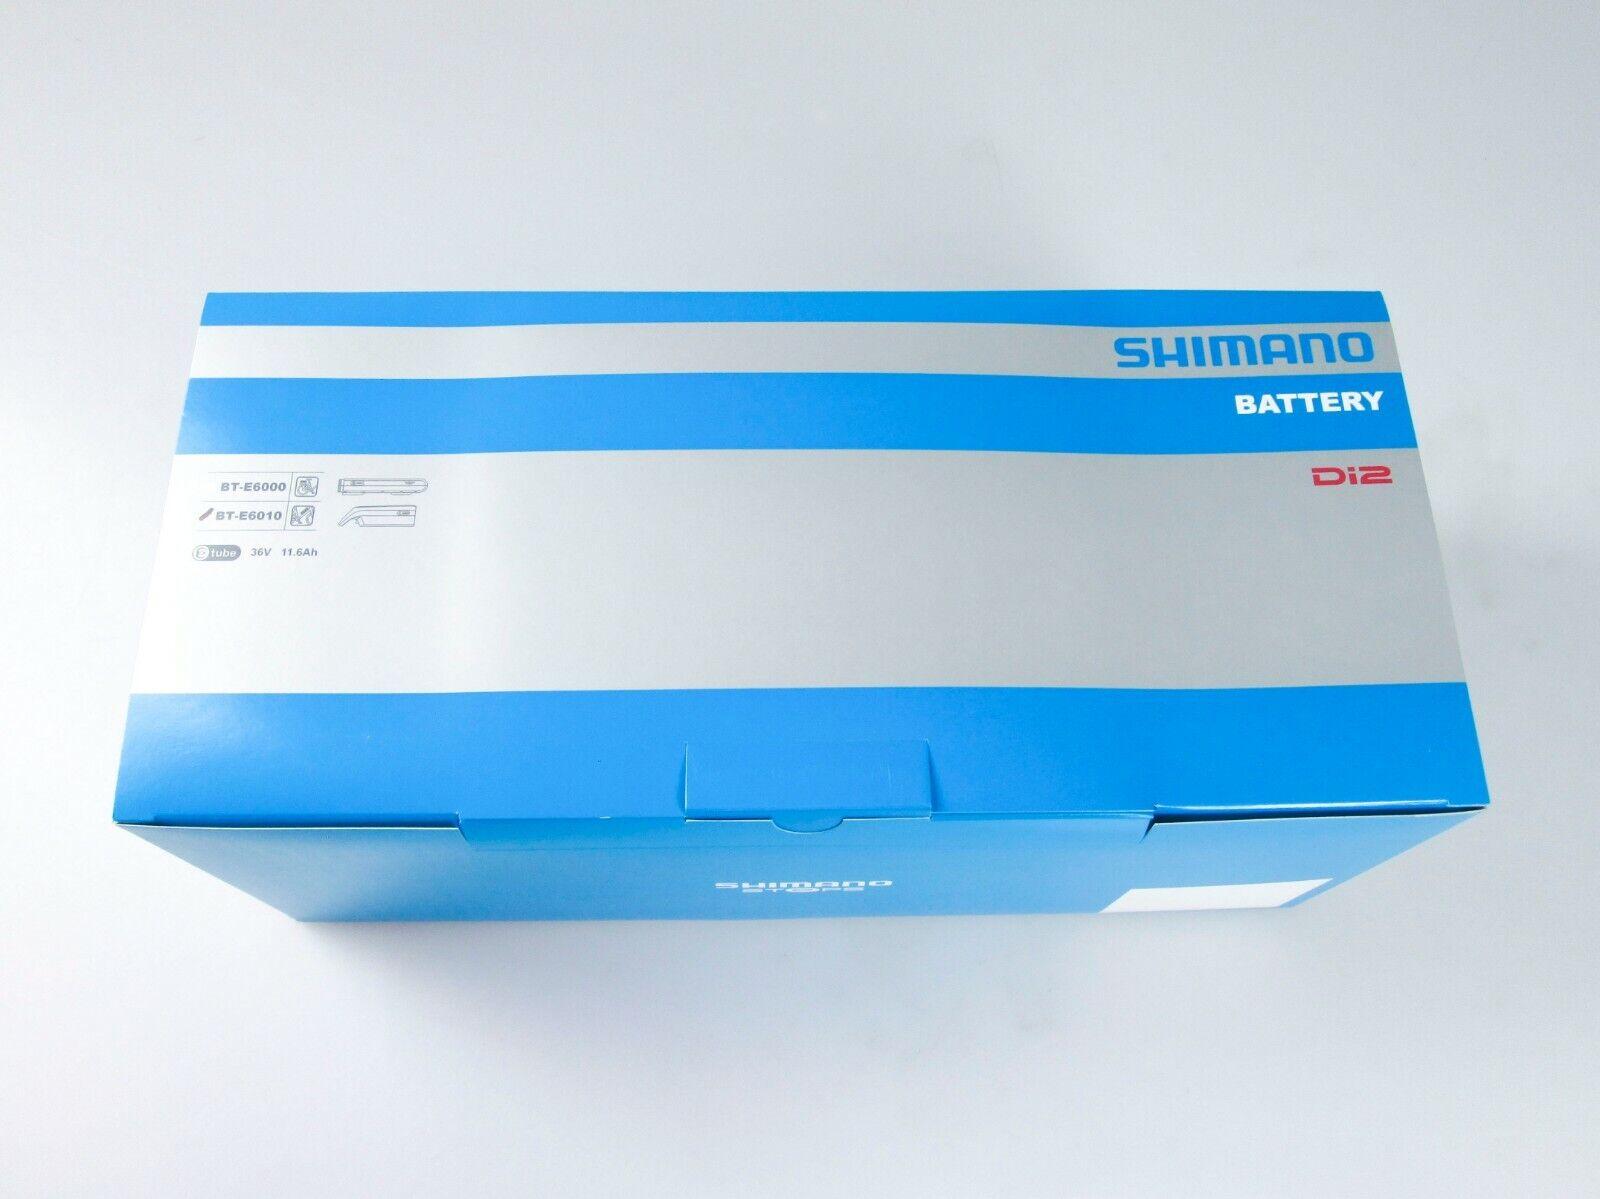 Shimano STEPS BT-E6010 BT-E6010 BT-E6010 e-Bike Battery  418Wh   Frame Down Tube Powerpack   Akku 62d8d6